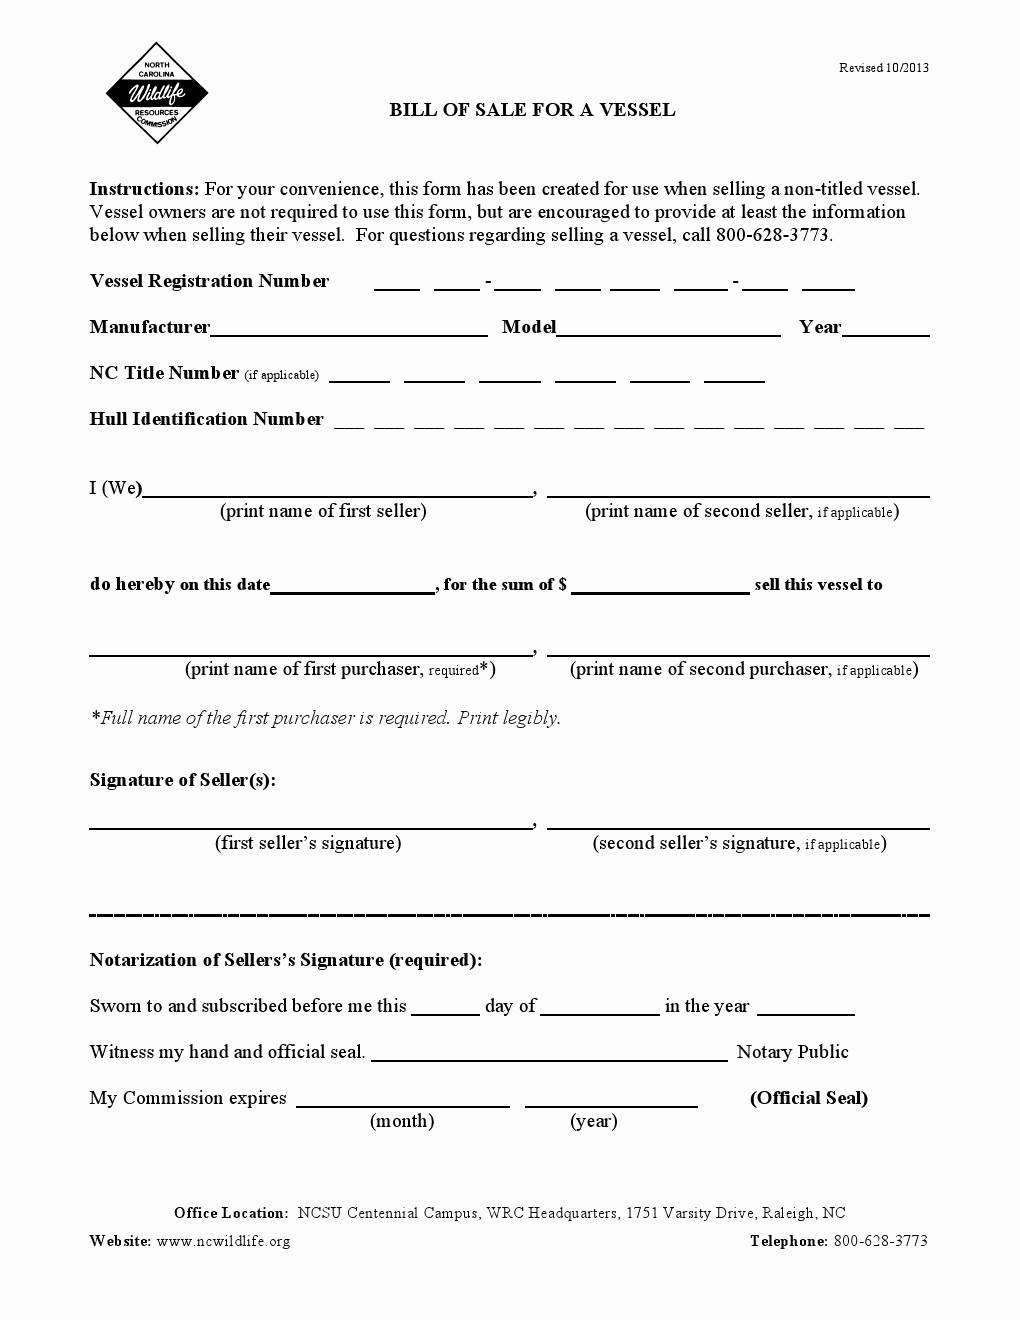 Bill Of Sale Printable Document Best Of Free north Carolina Vessel Bill Of Sale form Download